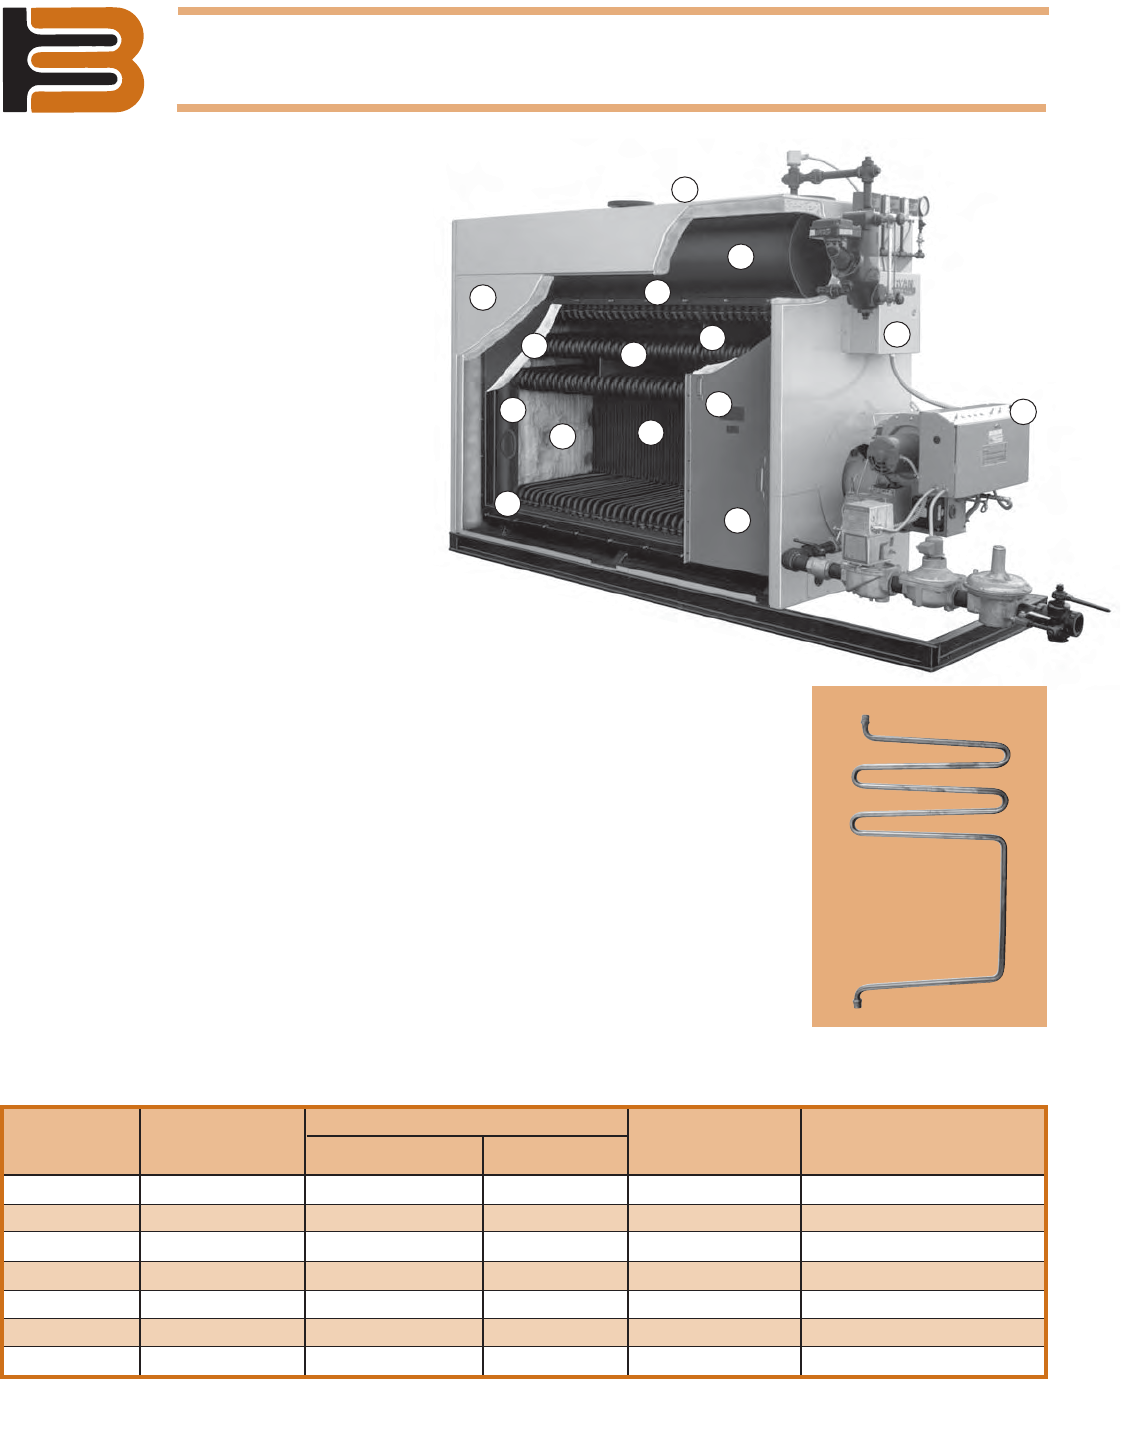 Enjoyable Bryan Boilers Eb 200 W Fdgo Users Manual Bys7447 Eb Steam Water Boilers Wiring Cloud Usnesfoxcilixyz